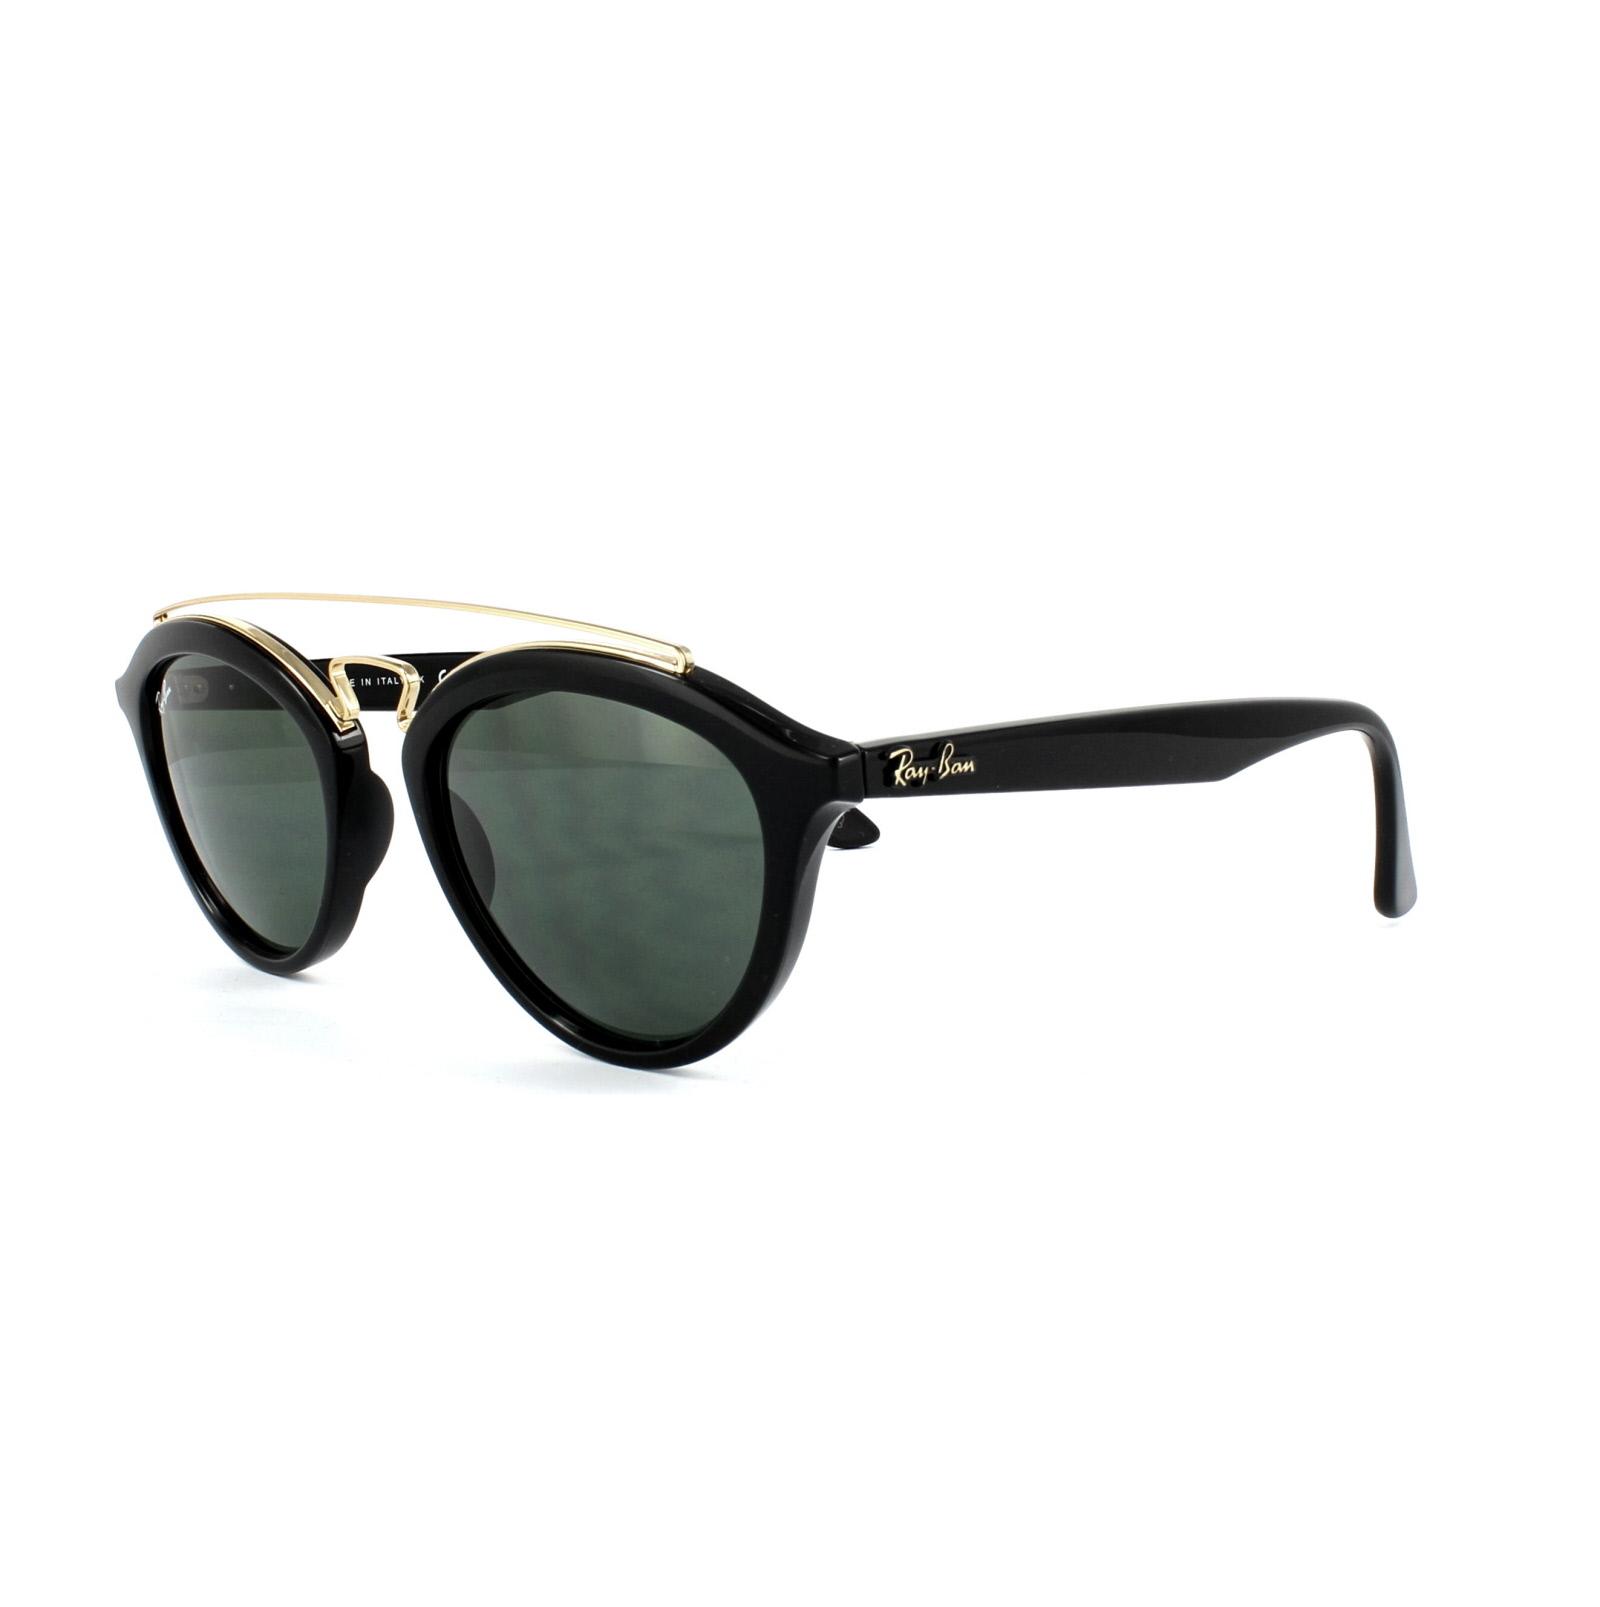 RAY BAN RAY-BAN Damen Sonnenbrille »New Gatsby Ii RB4257«, schwarz, 601/71 - schwarz/grün